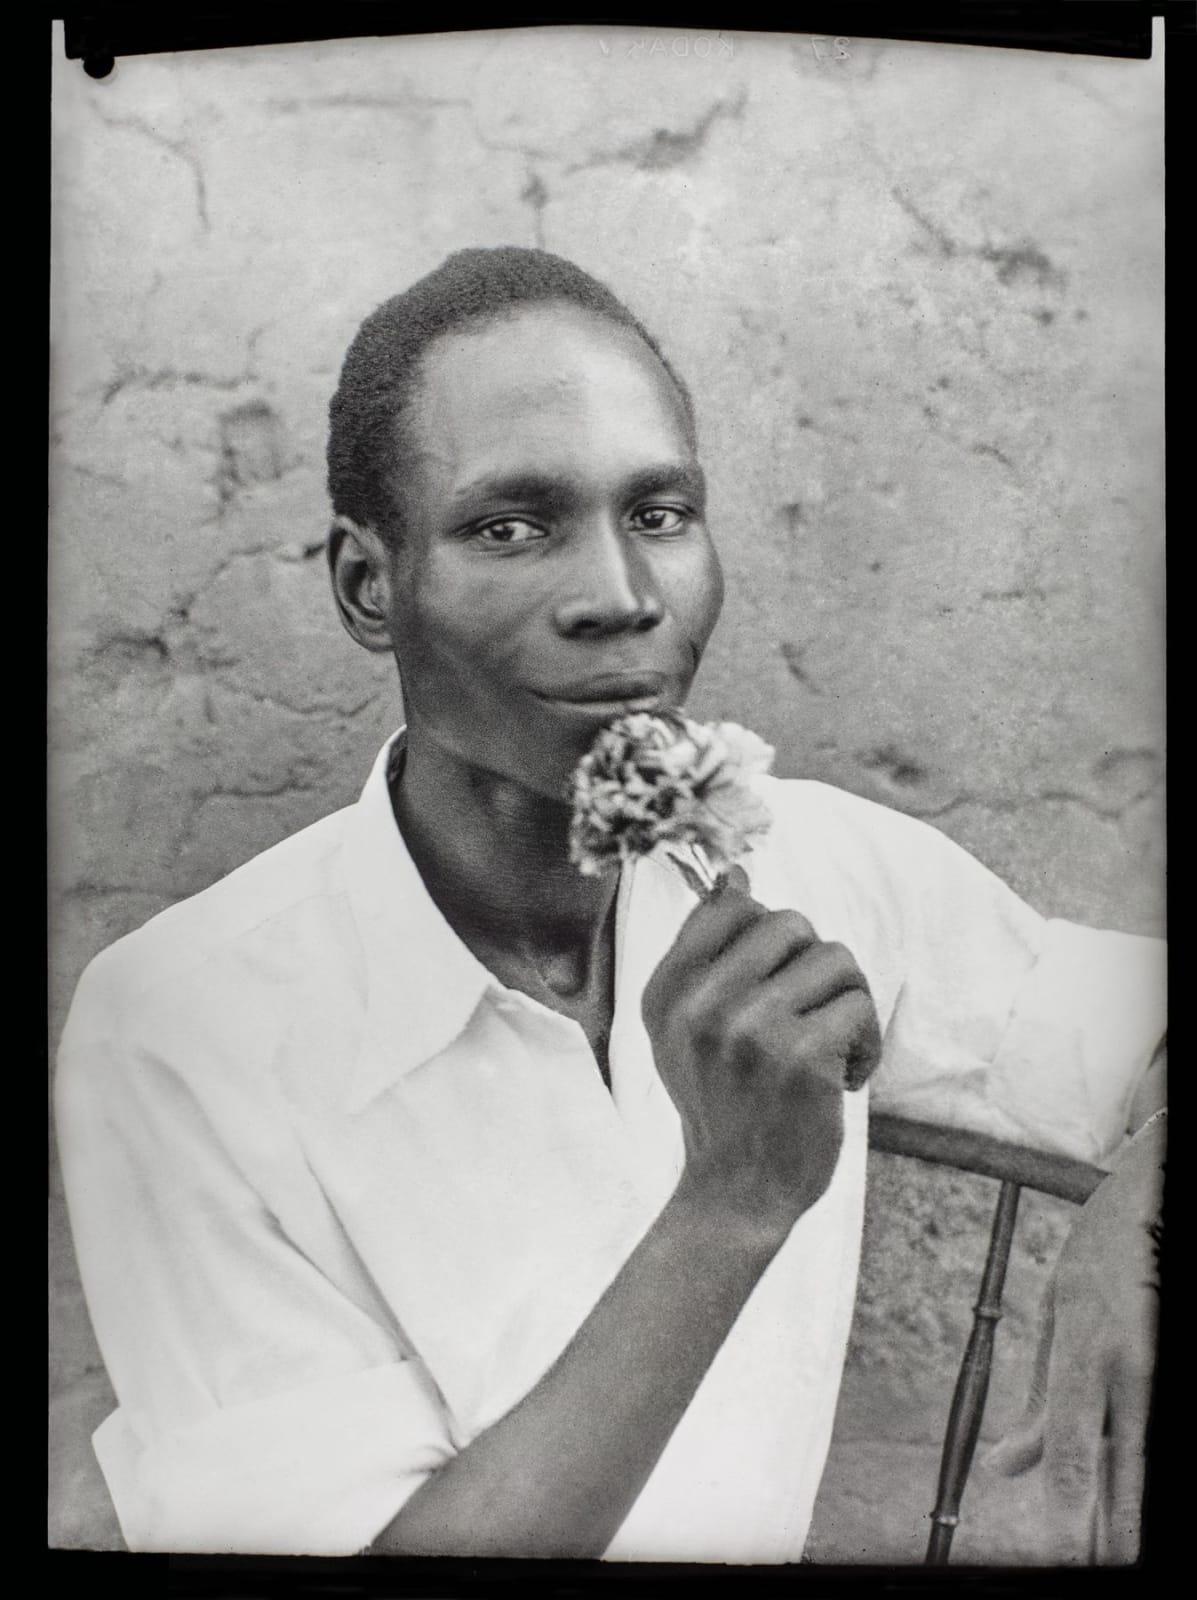 Self-portrait, 1950s